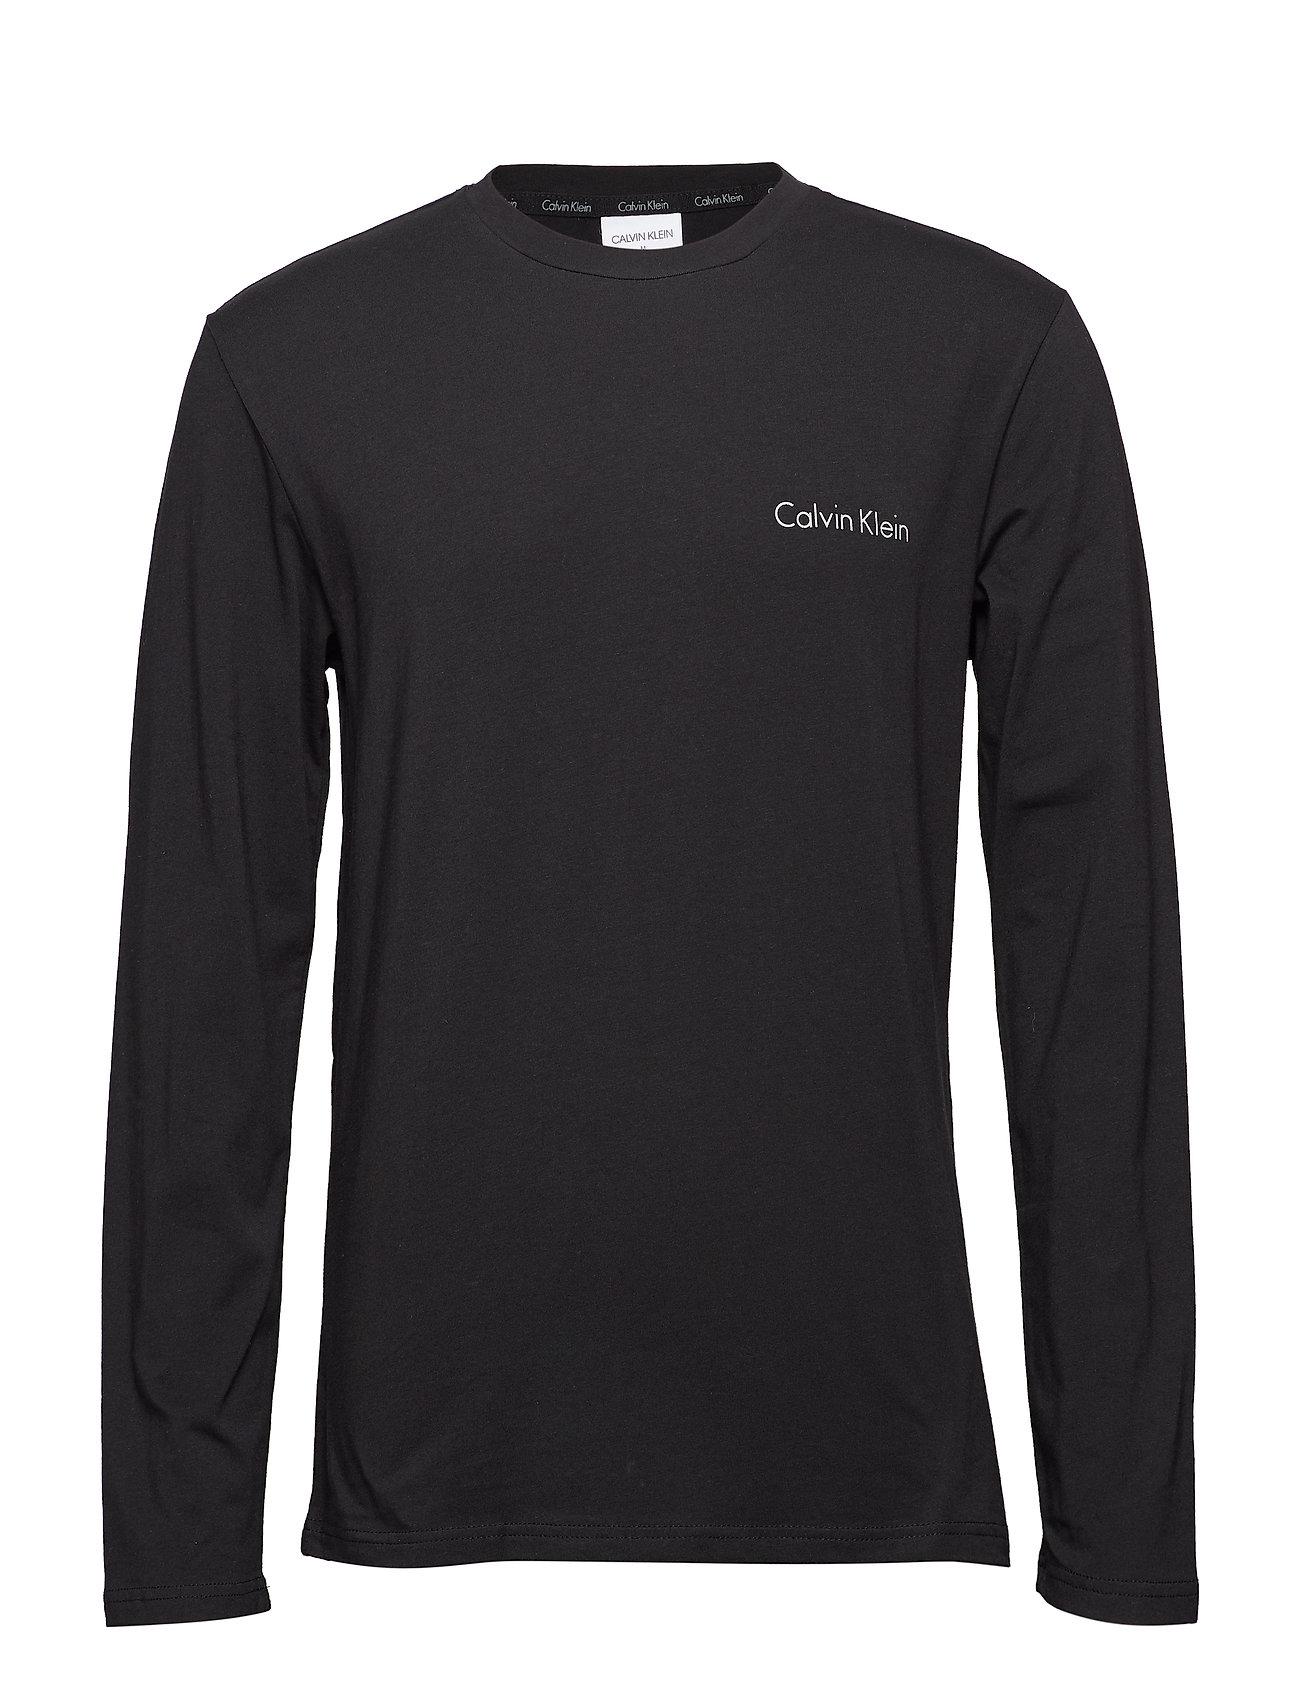 Calvin Klein L/S PANT SET - BLACK TOP/WAEVE GEO BLACK PANT